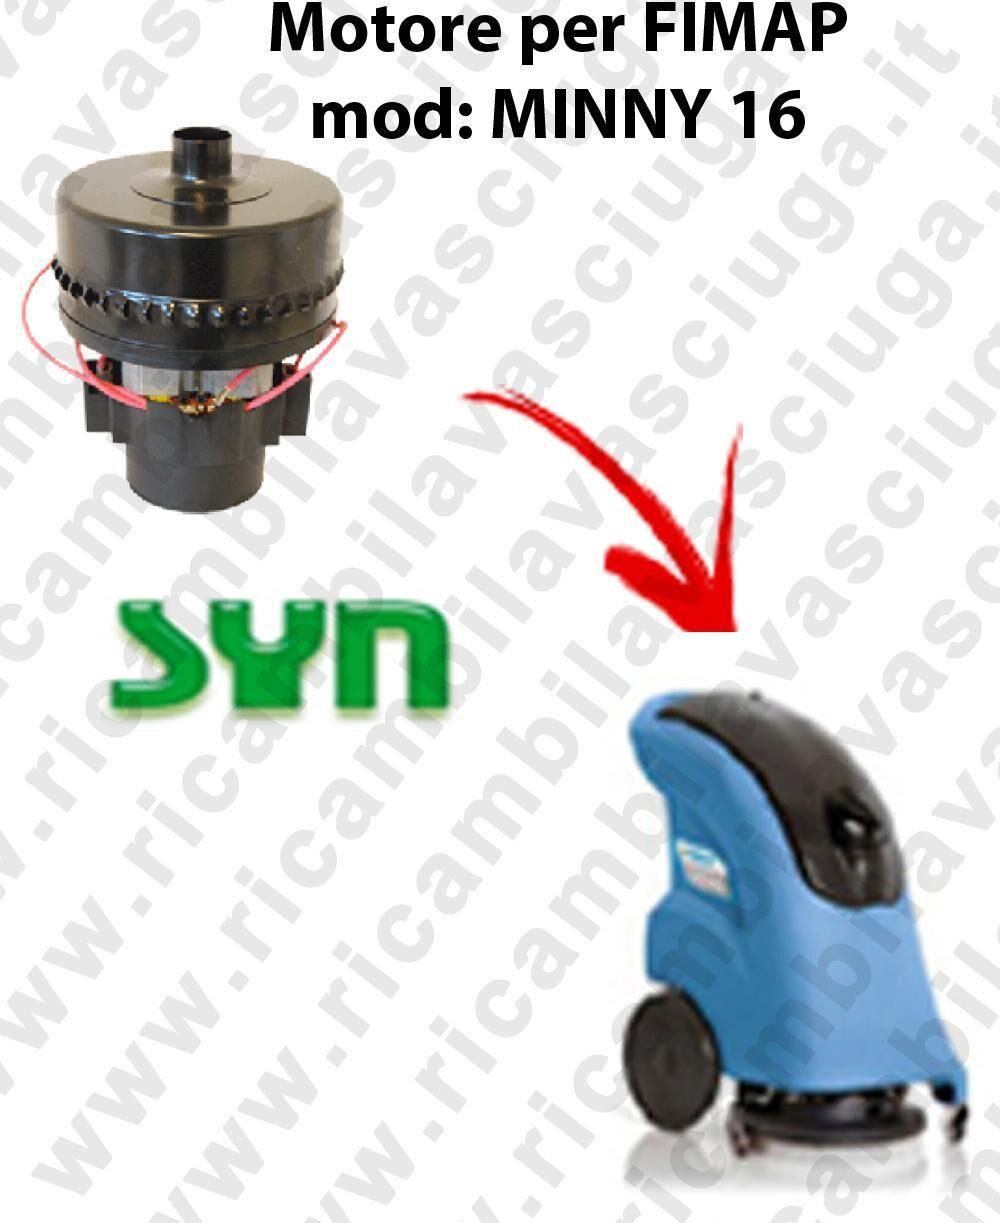 Fimap MINNY 16 Motore aspirazione SYN per lavapavimenti